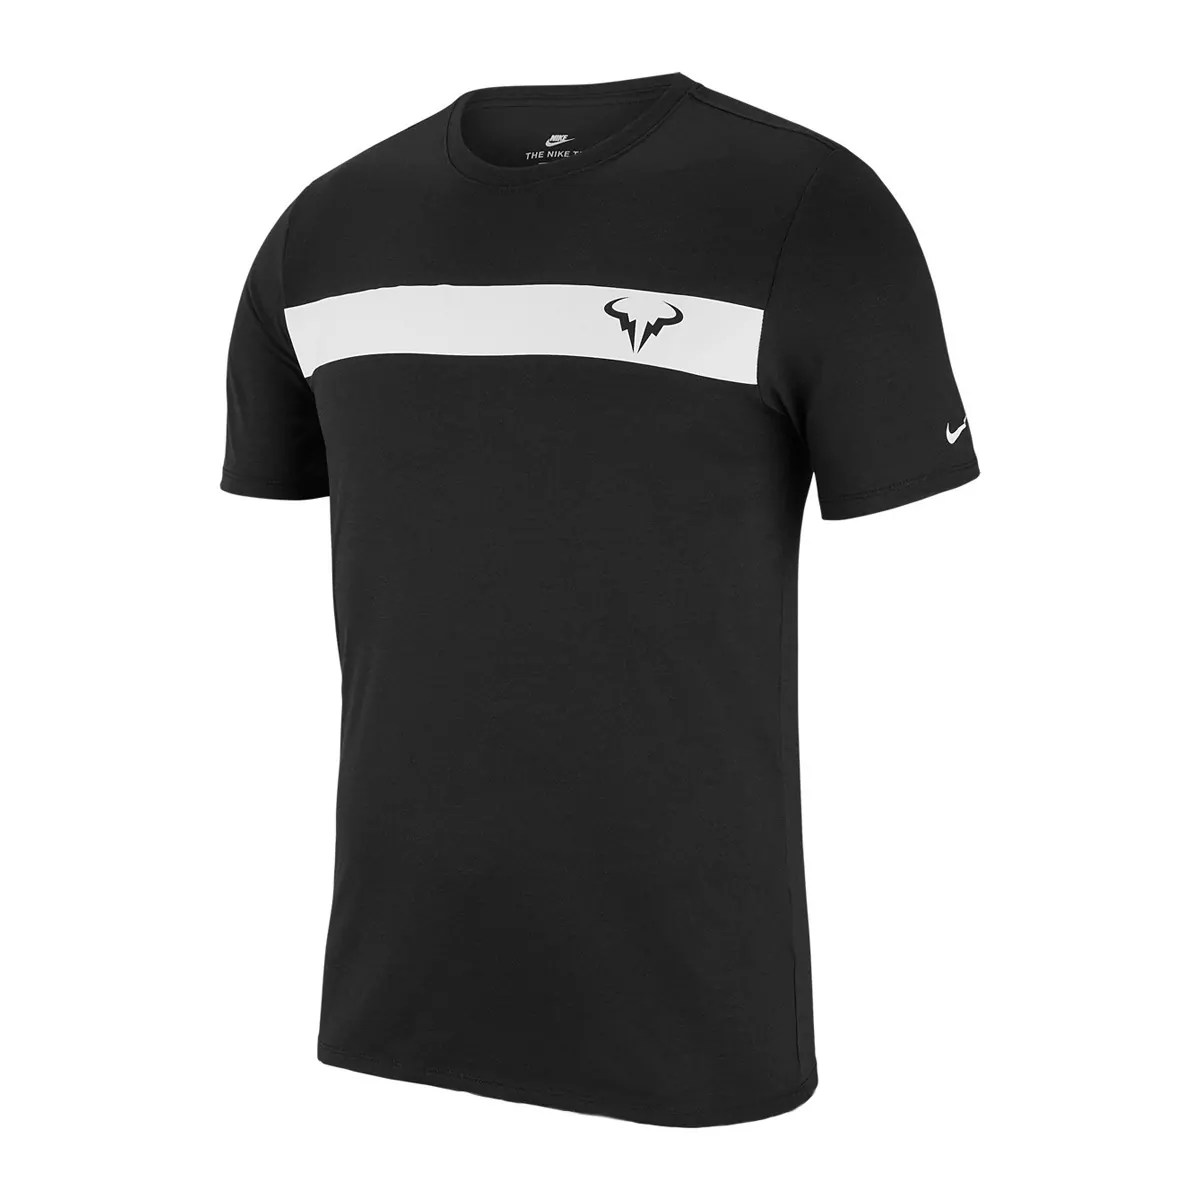 5e13fbf984 Camiseta Nike Rafael Nadal - Empório do Tenista